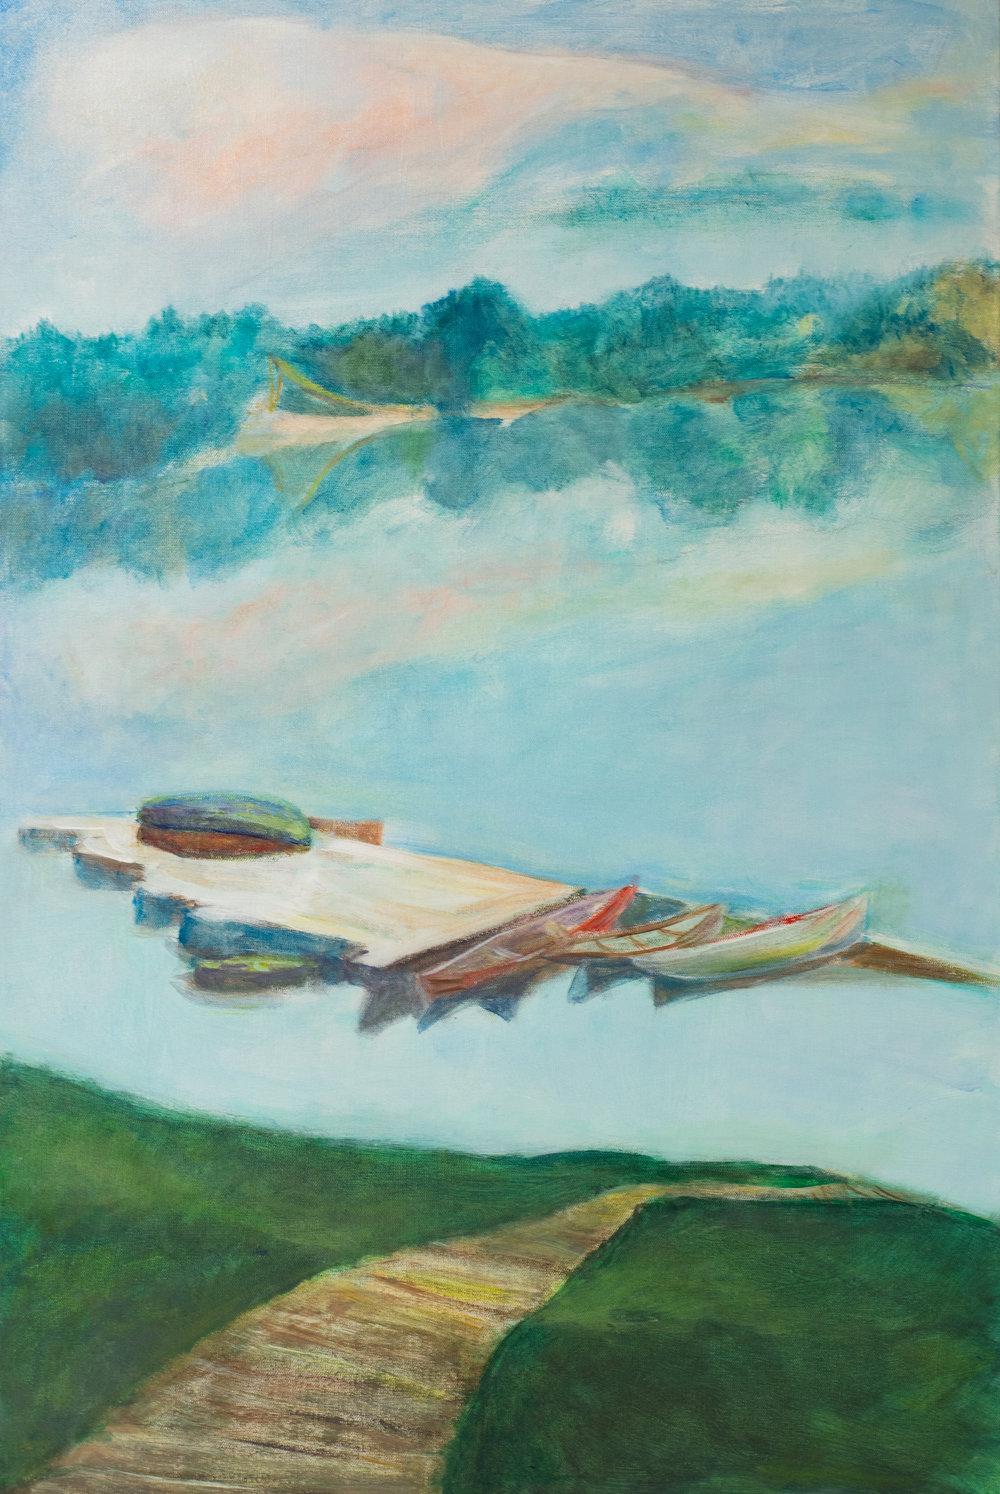 """Wricampea Lake"" acrylic on canvas 24 x 36 Tachel Lulov Segall"